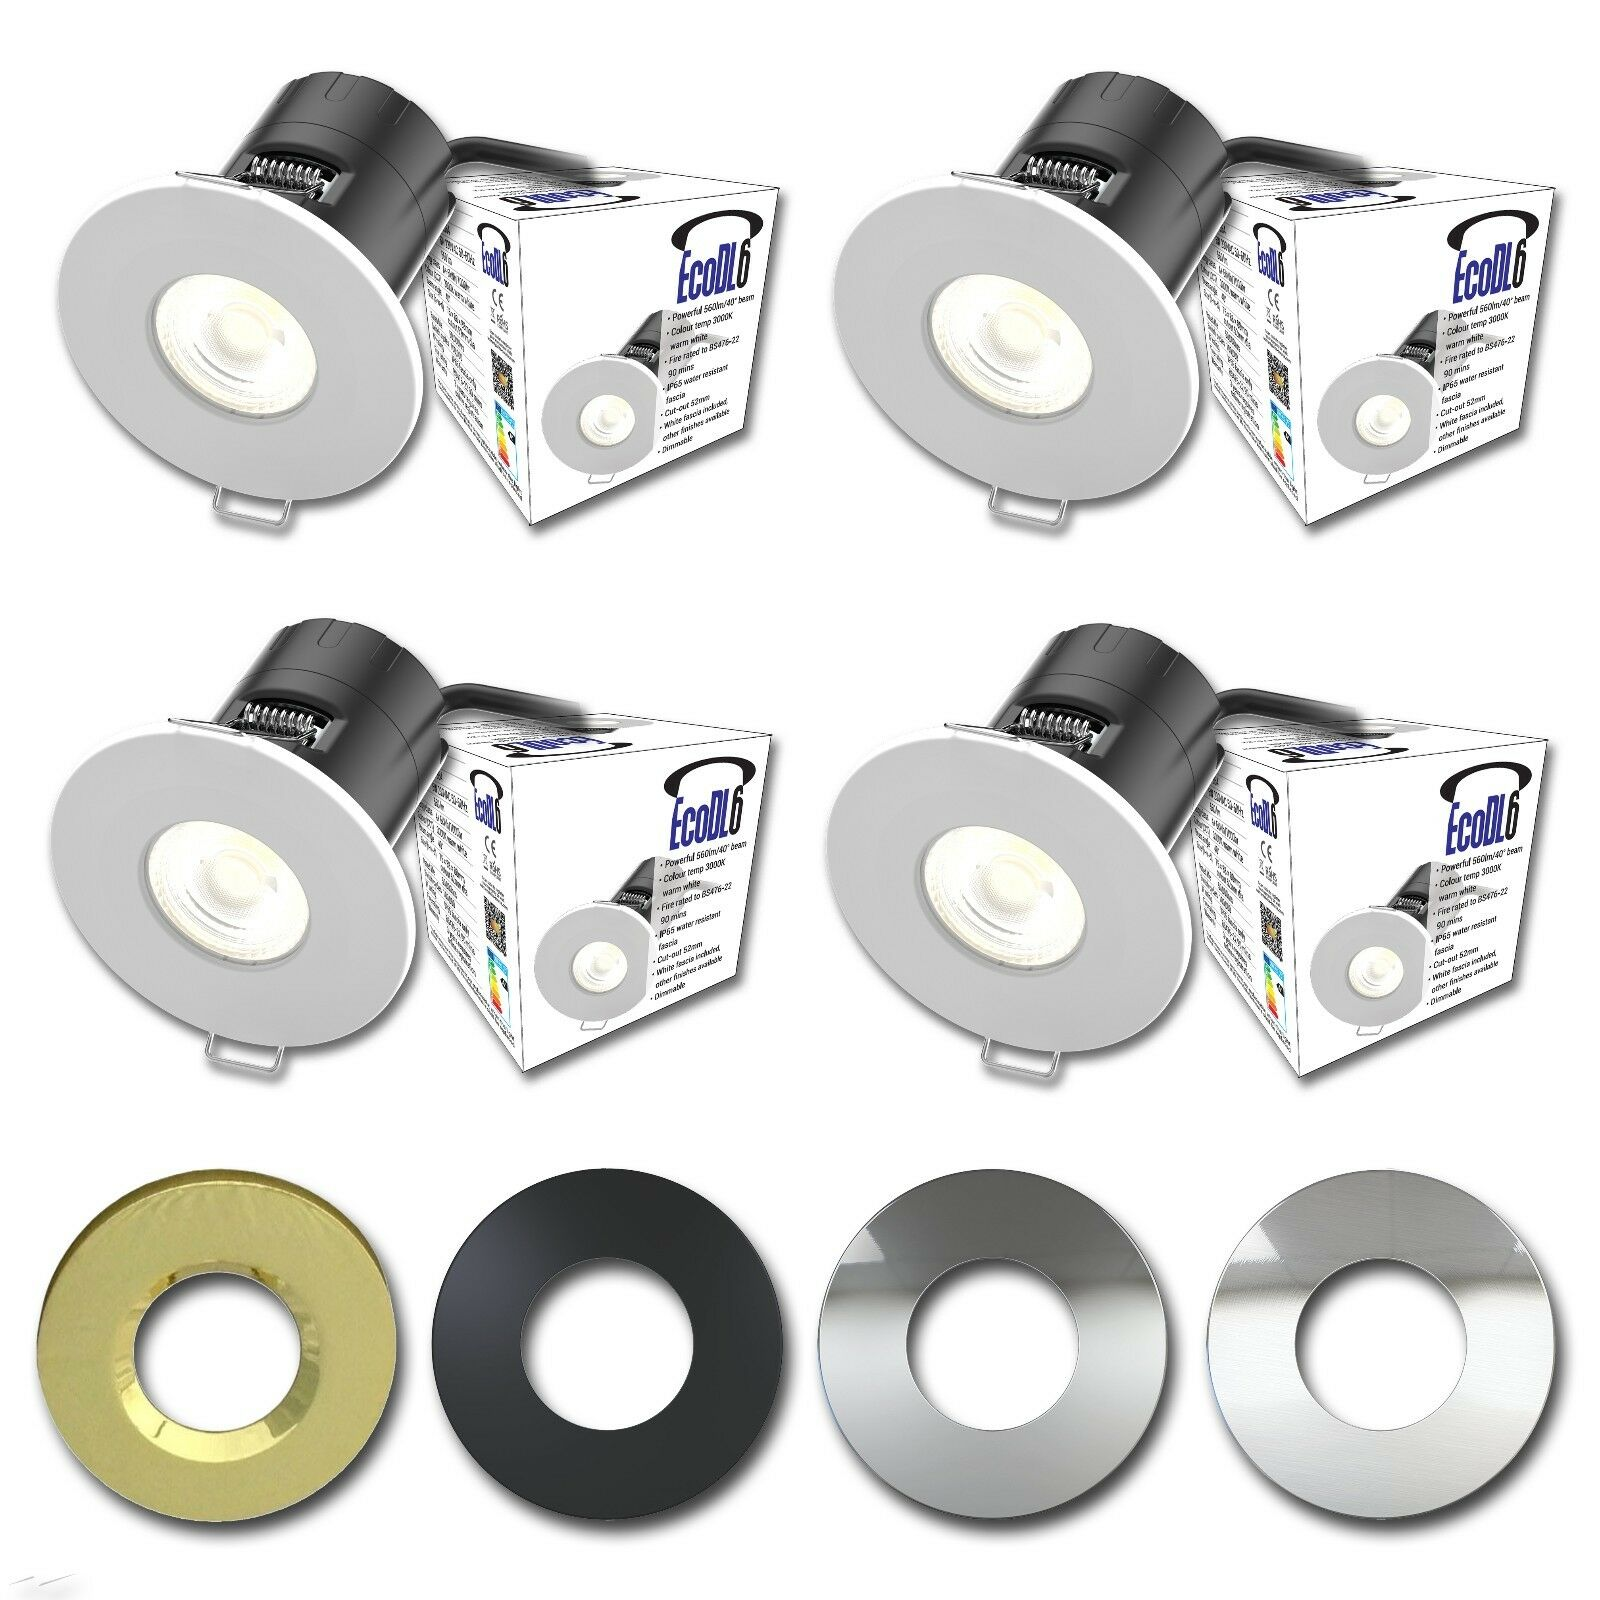 Toilettenpapier Rollen Klopapier WC-Papier Papierhandt/ücher Papier 200403 010395 Gelb